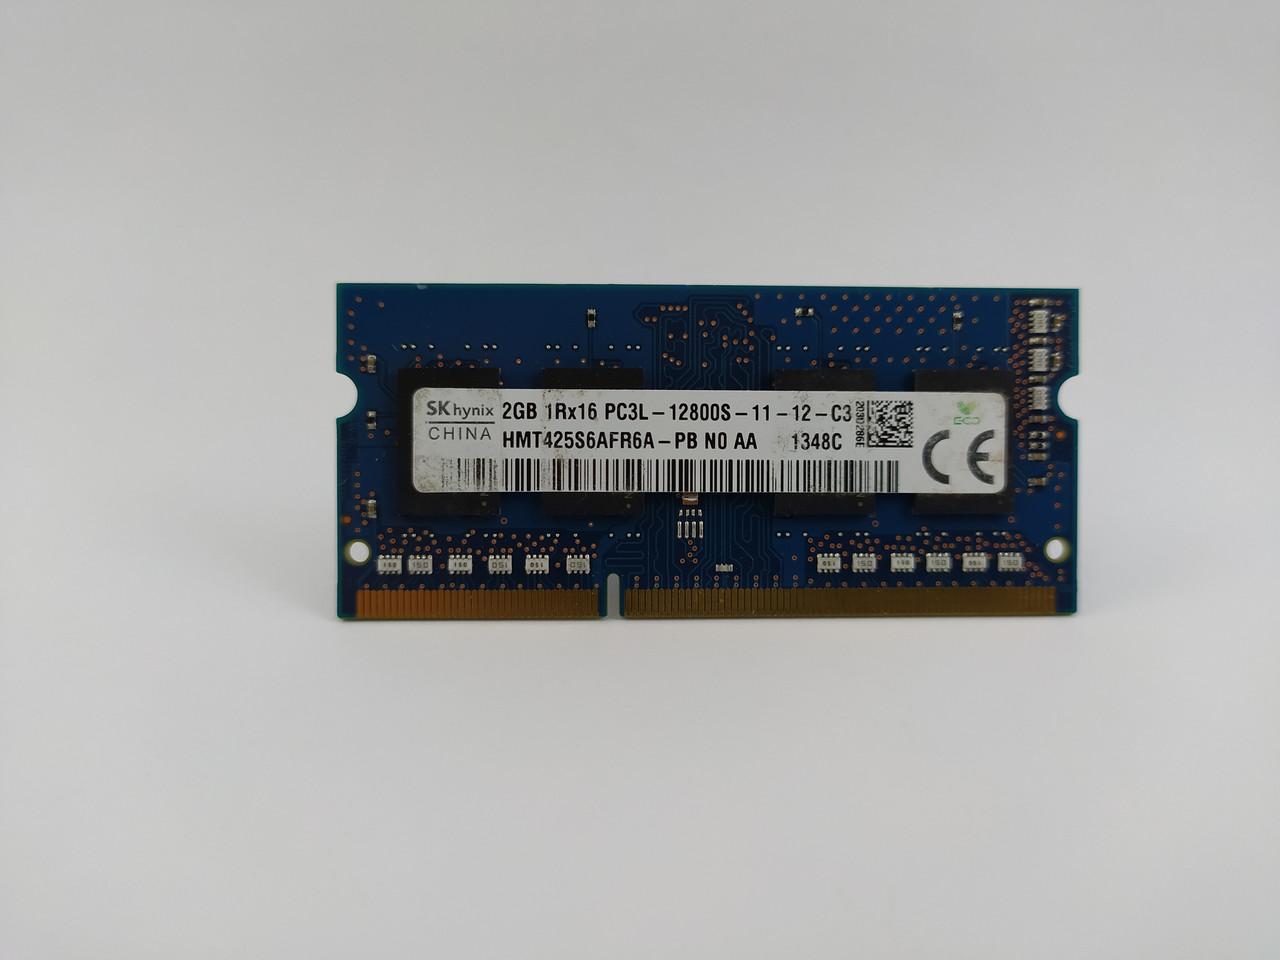 Оперативная память для ноутбука SODIMM SK hynix DDR3L 2Gb 1600MHz PC3L-12800S (HMT425S6AFR6A-PB) Б/У